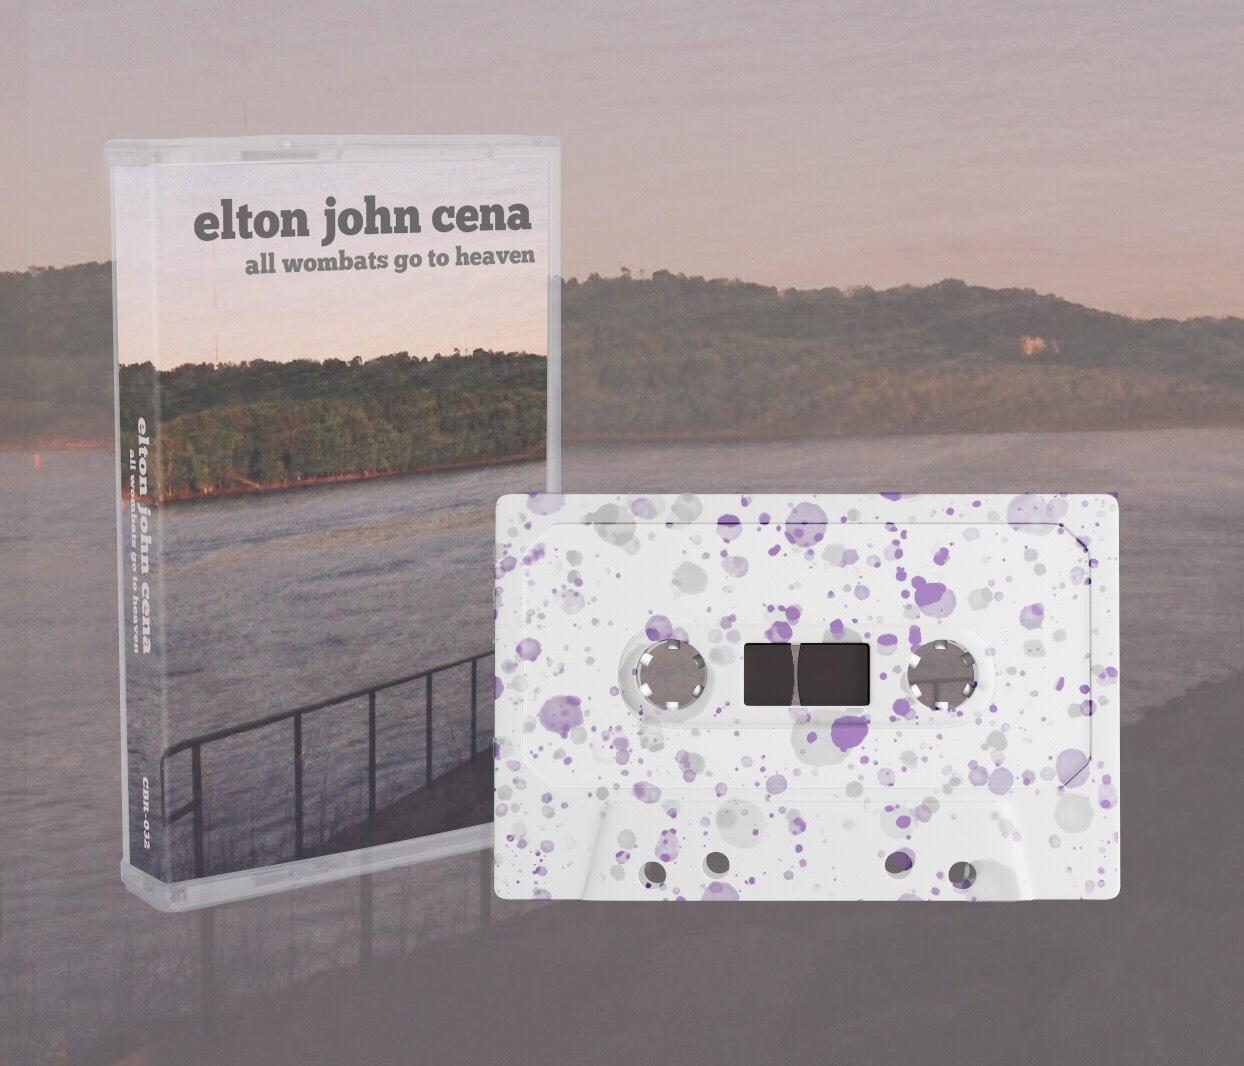 Elton John Cena - All Wombats Go to Heaven